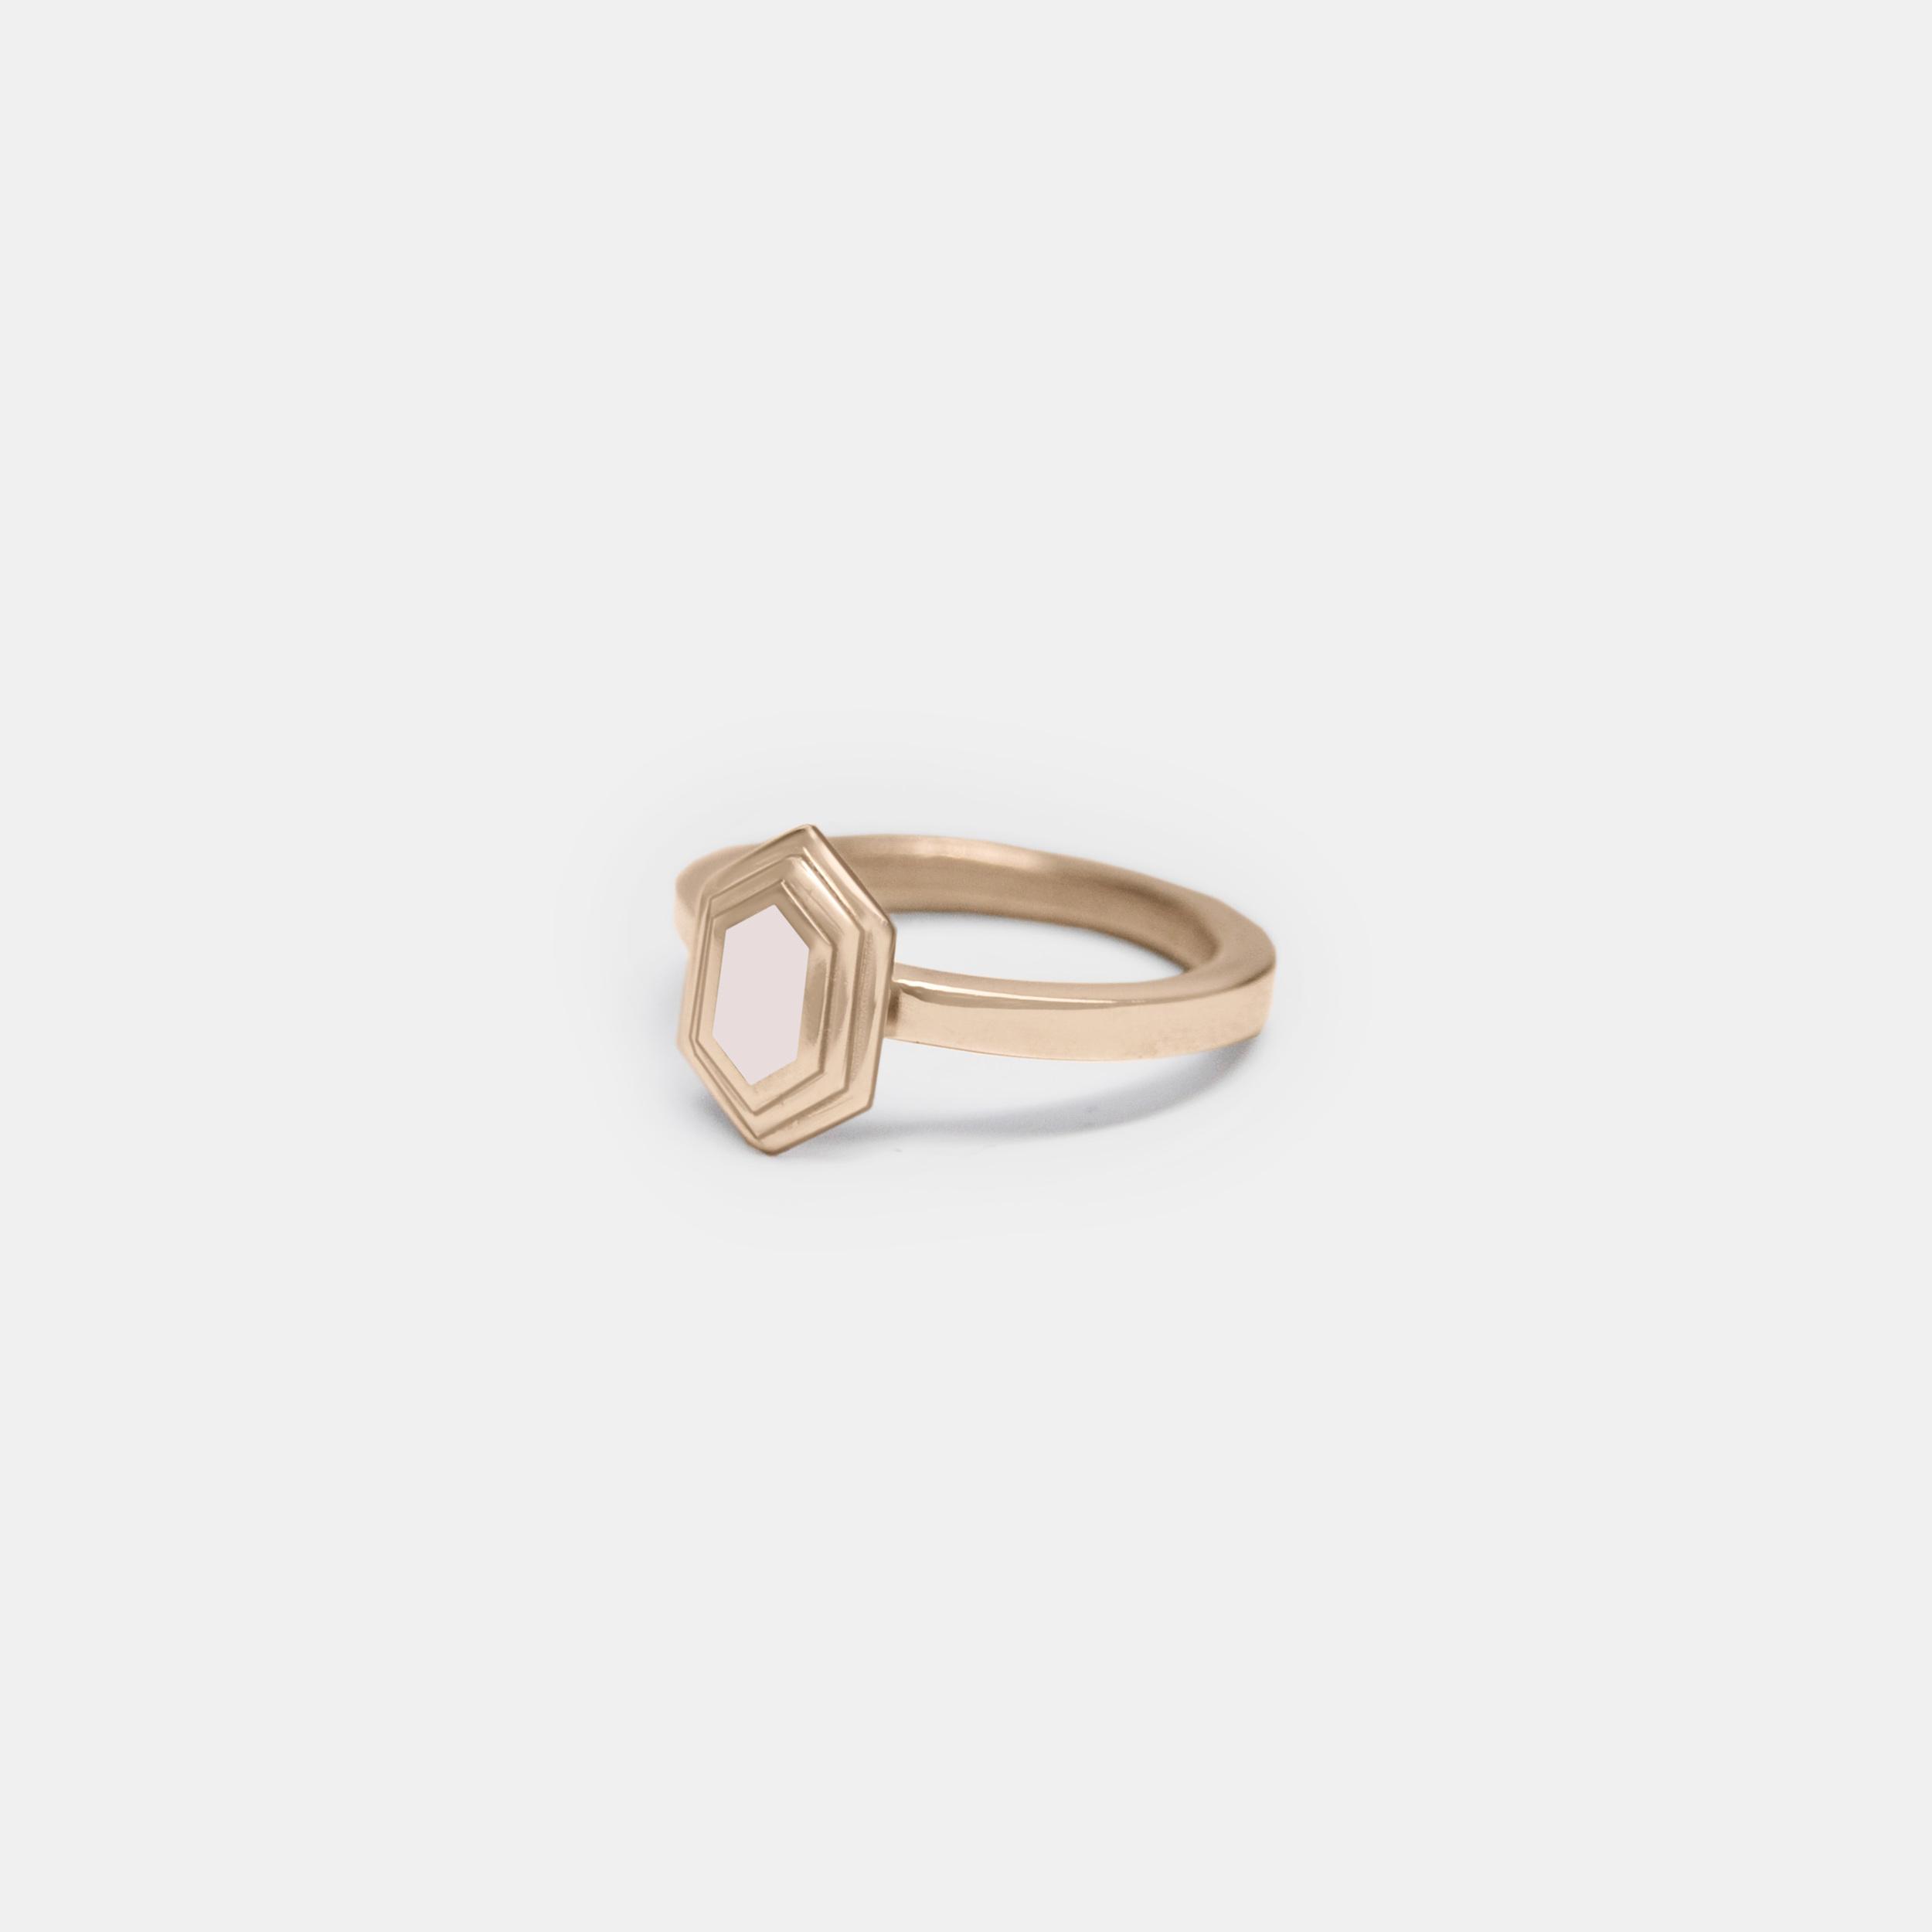 Marisa-Lomonaco-Custom-Jewelry-Hudson-Valley_0001_Axis-Ring-Bronze-Pink.jpg